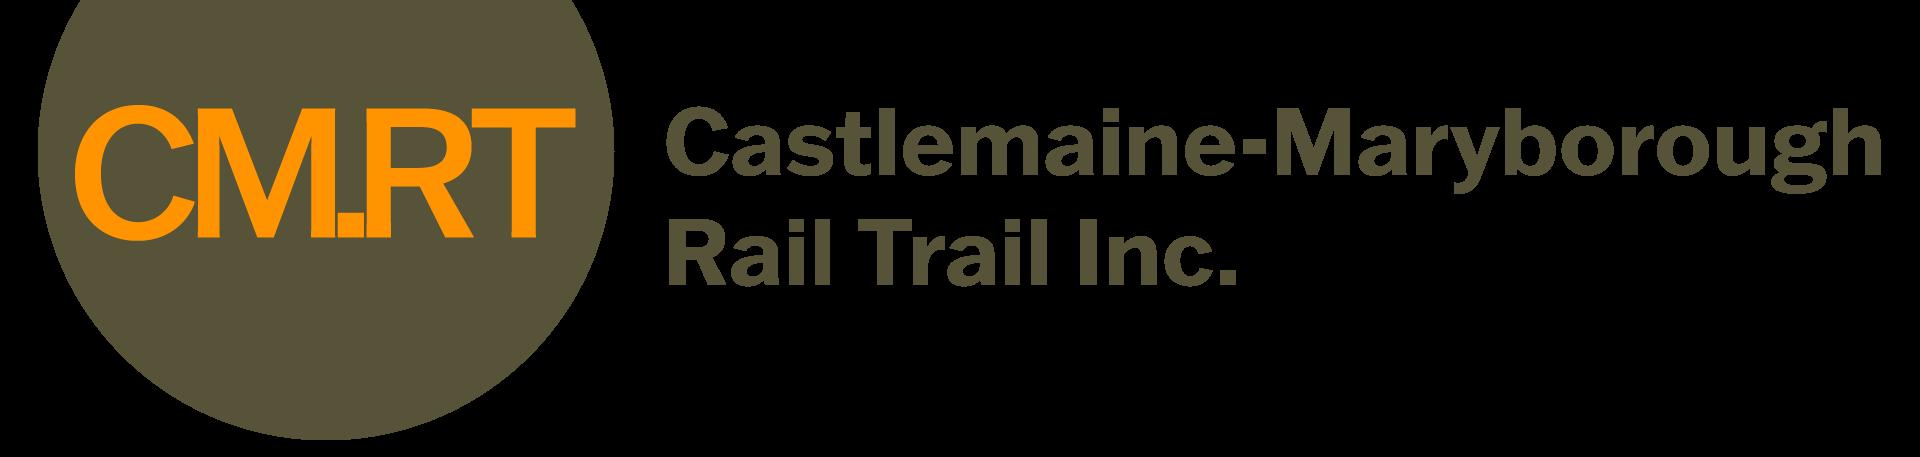 Castlemaine-Maryborough Rail Trail